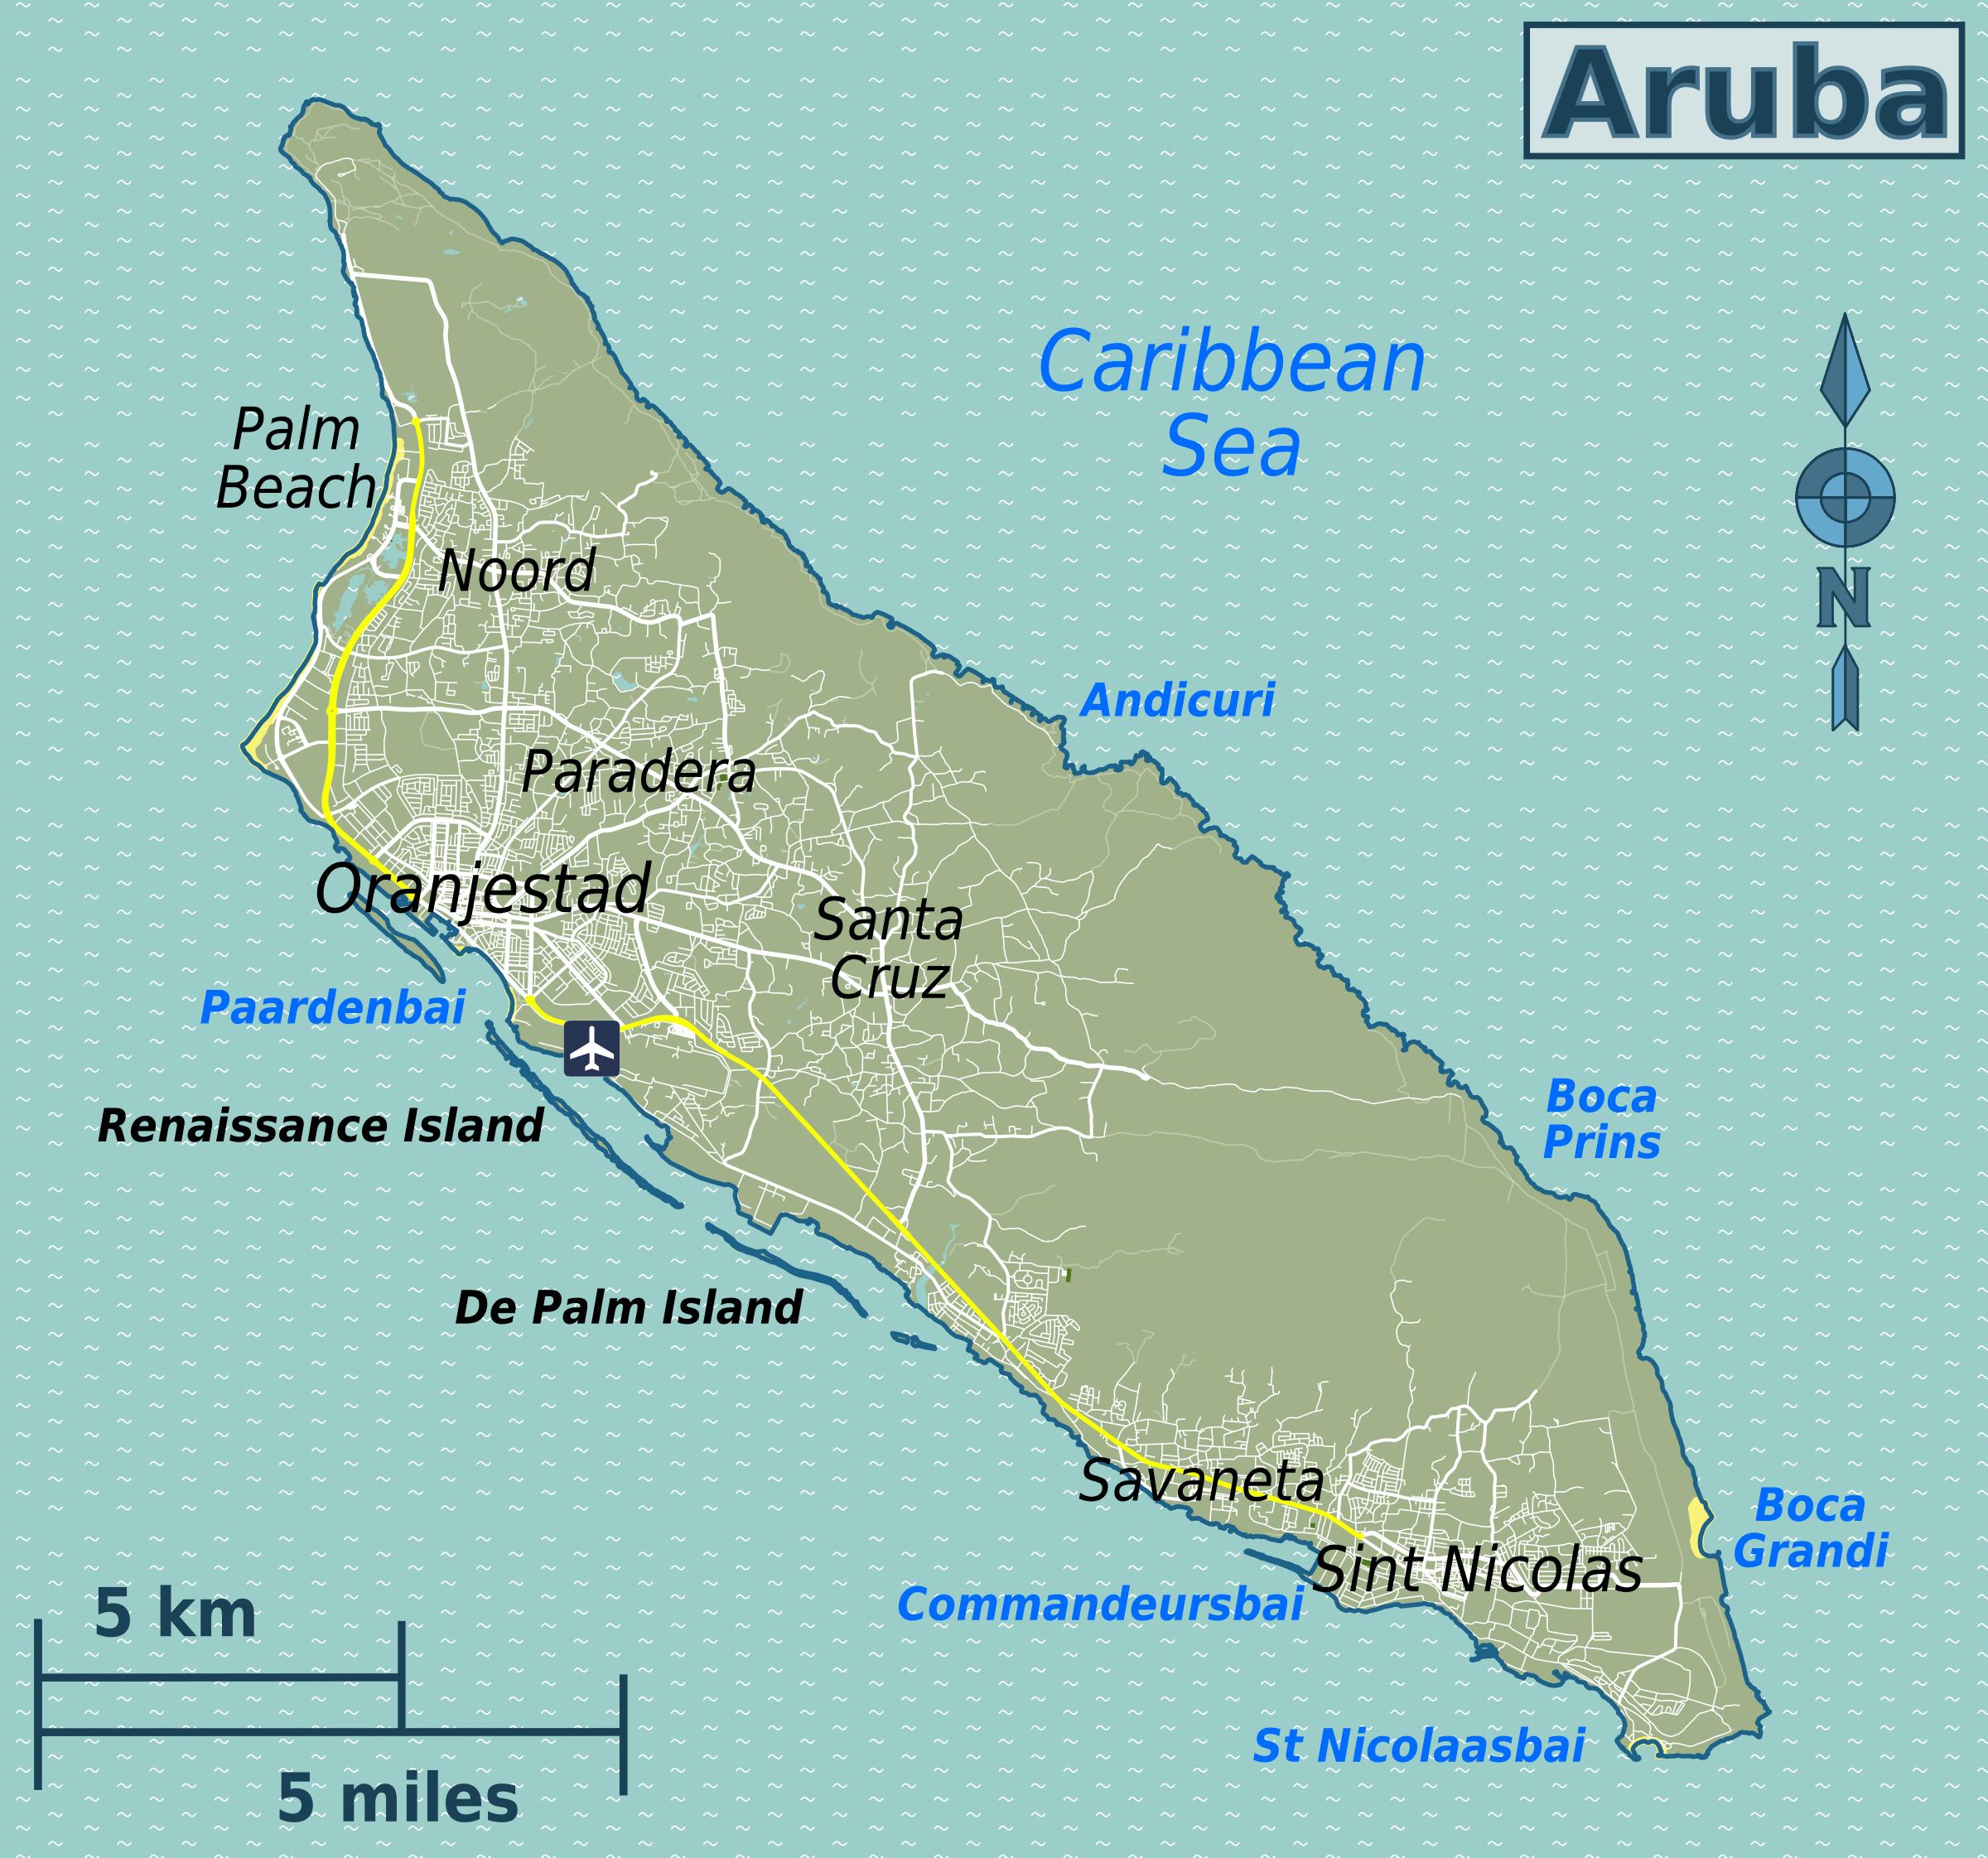 FileAruba travel mappng Wikimedia Commons